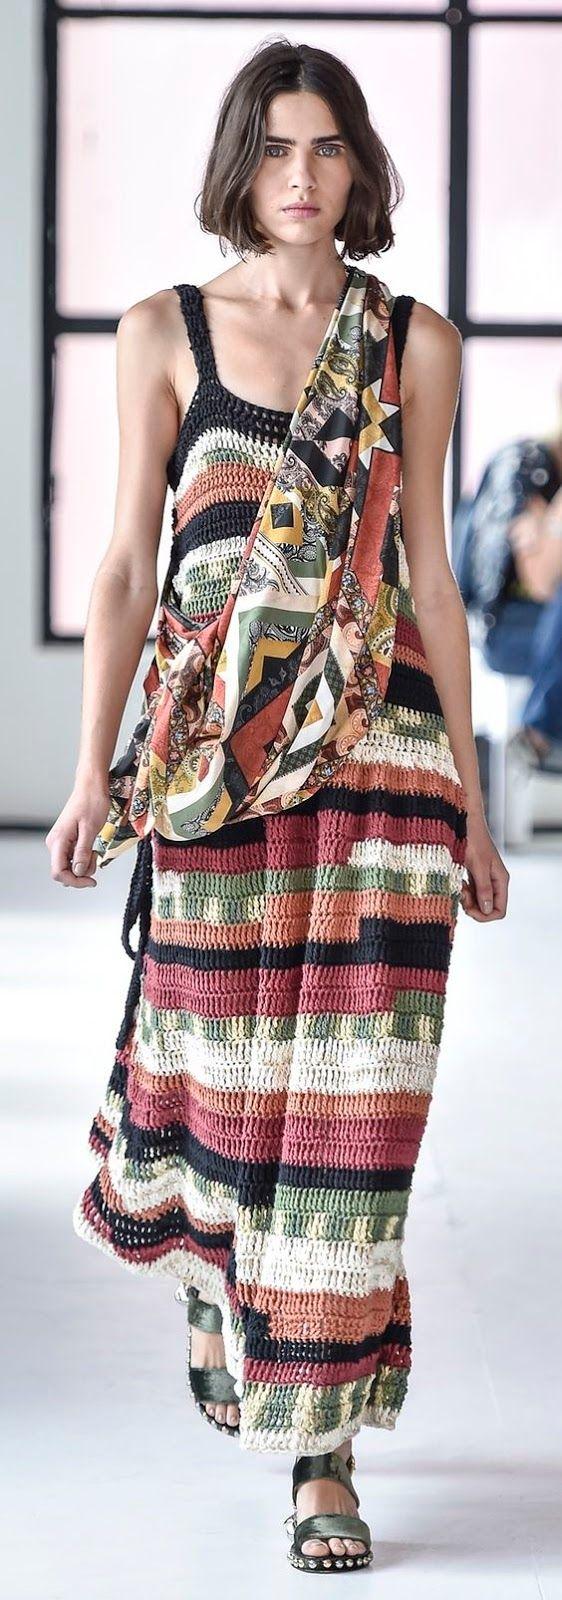 María Cielo: Crochet inspiración: vestido largo